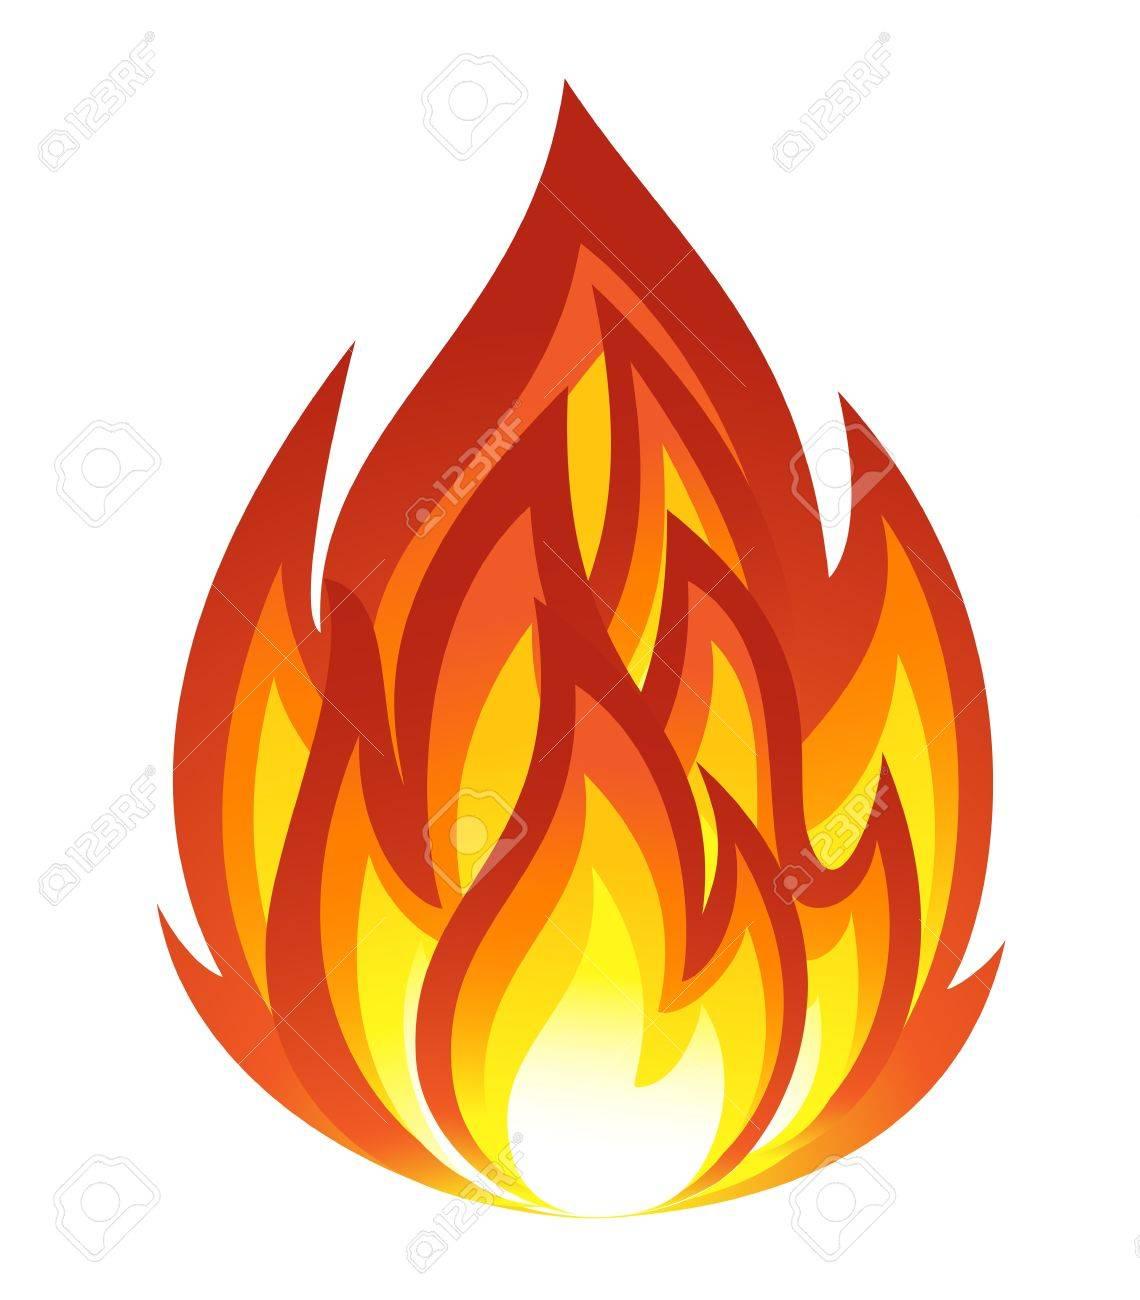 Symbol Of Fire Royalty Free Cliparts Vetores E Ilustraes Stock